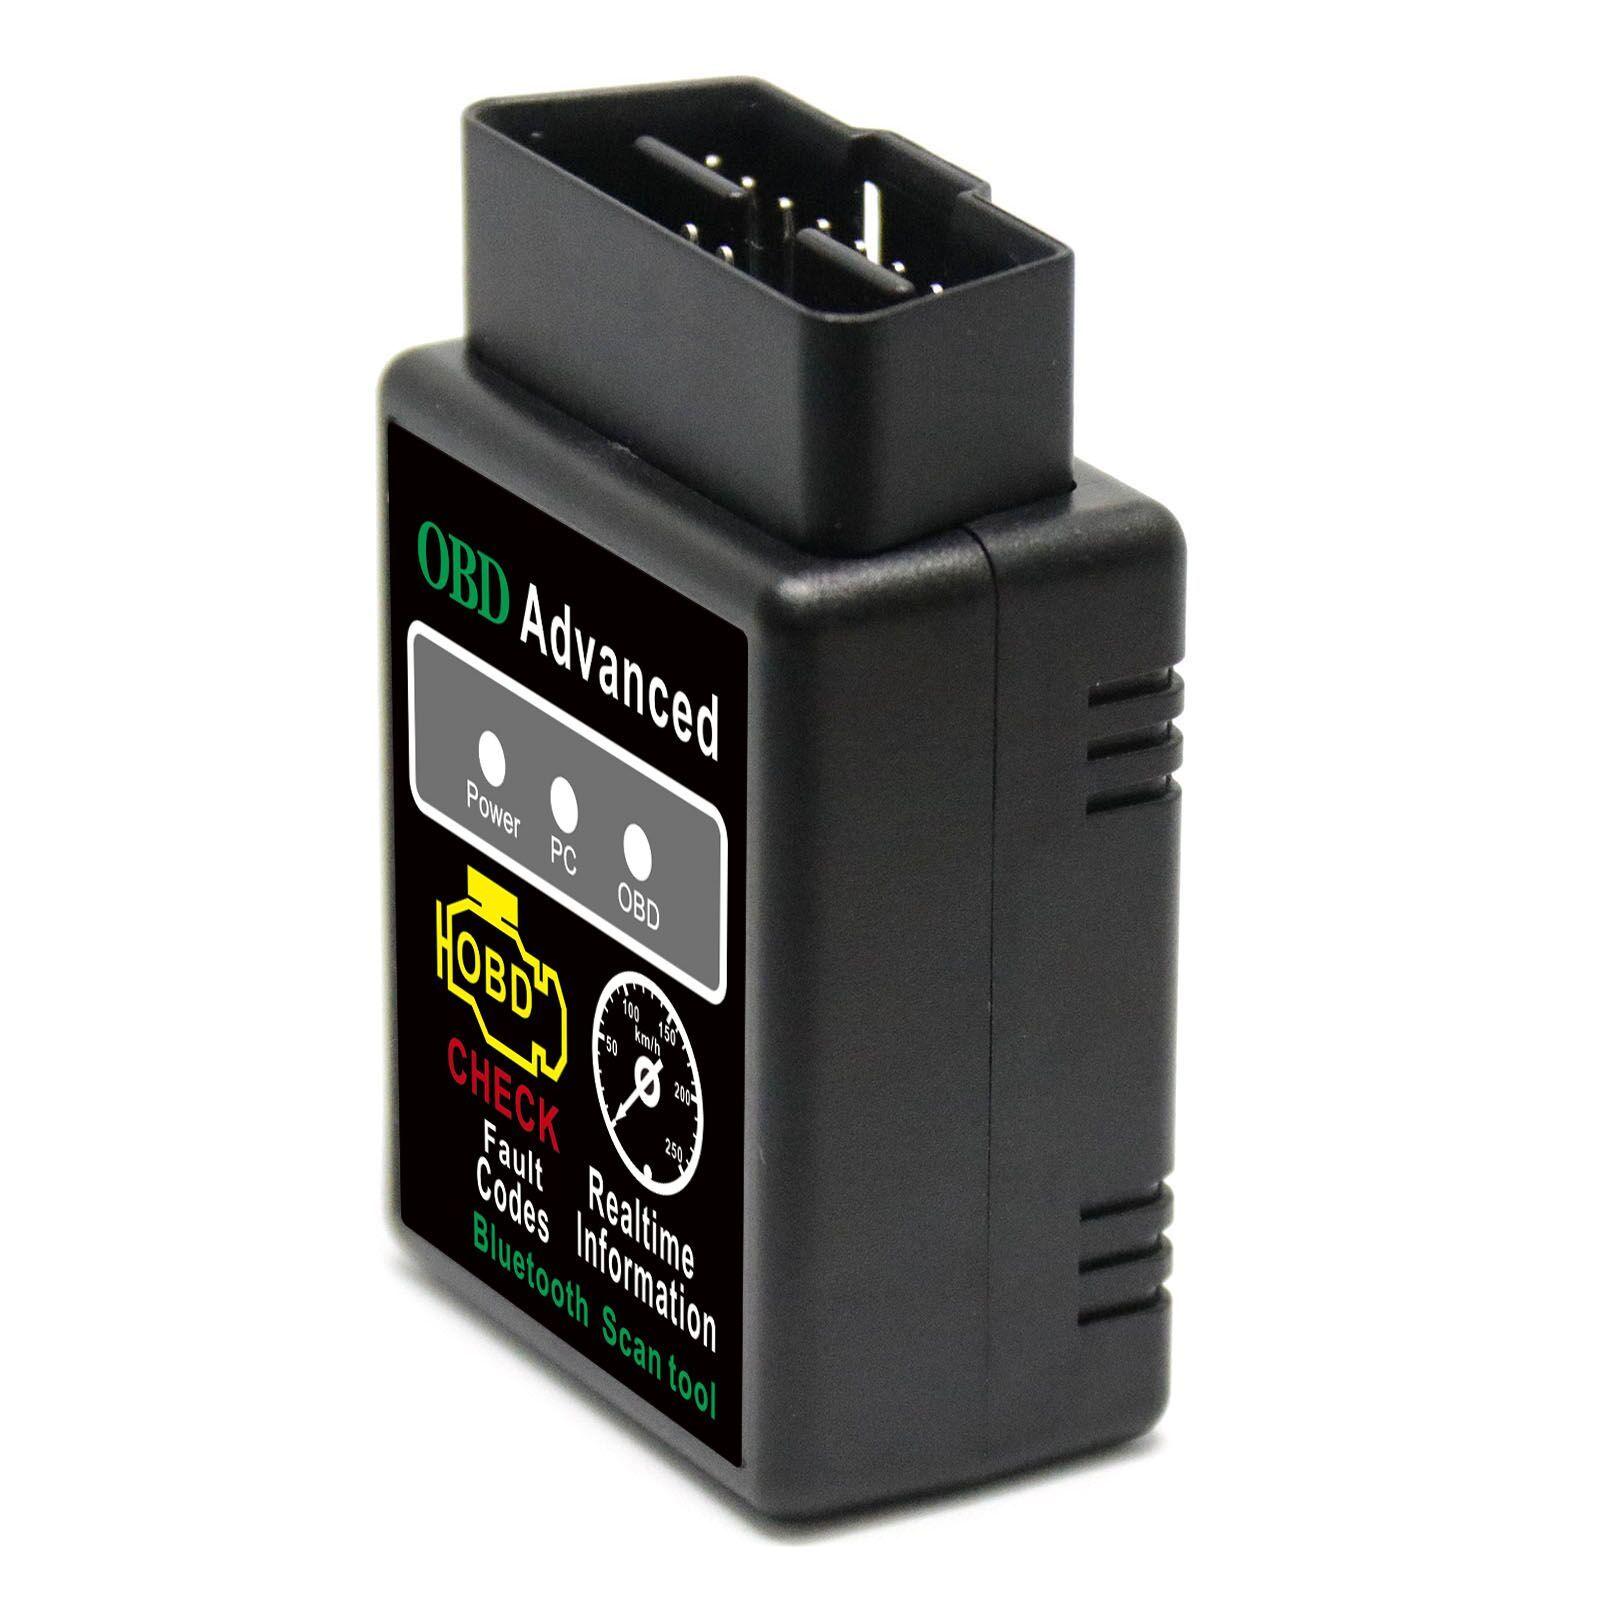 Vgate Tarama aracı Kalite A + V1.5 Sürüm 1.5 Süper OBD Tarama mini elm327 Bluetooth elm 327 OBDII OBD2 Otomatik Teşhis intercace